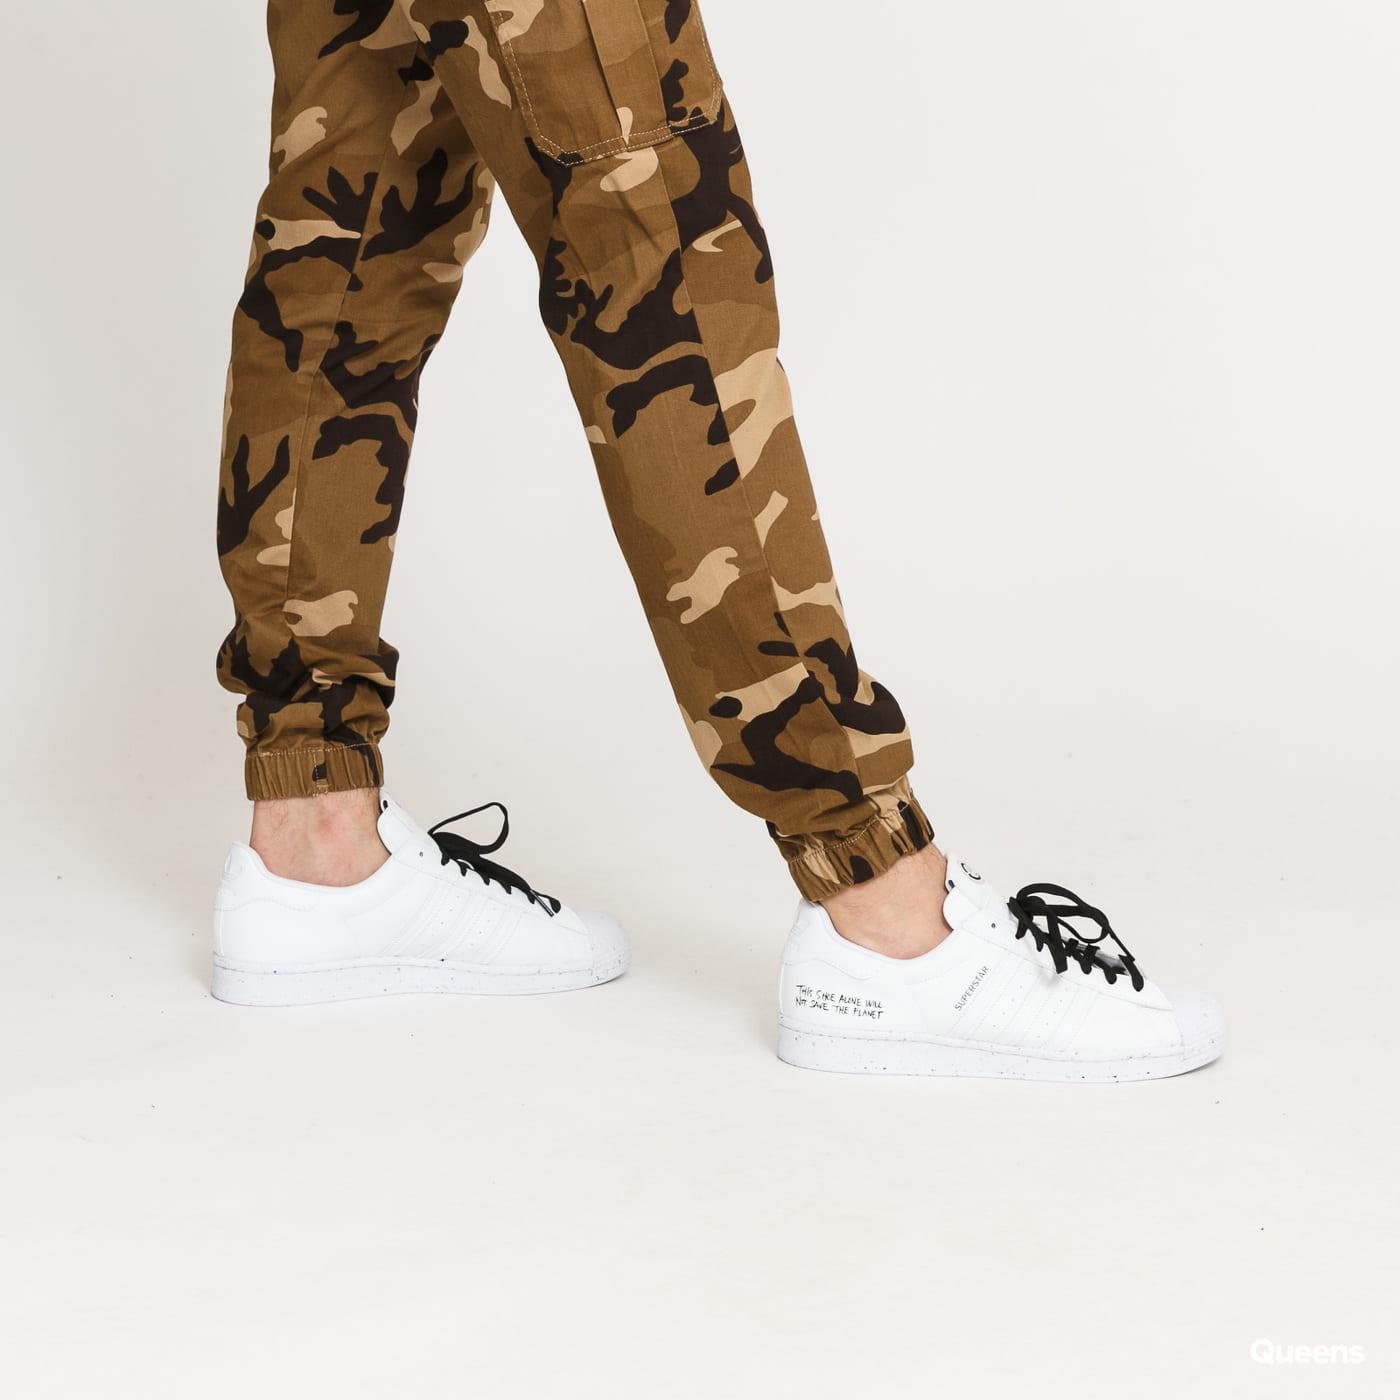 Urban Classics Camo Cargo Jogging Pants 2.0 camo beige / brown